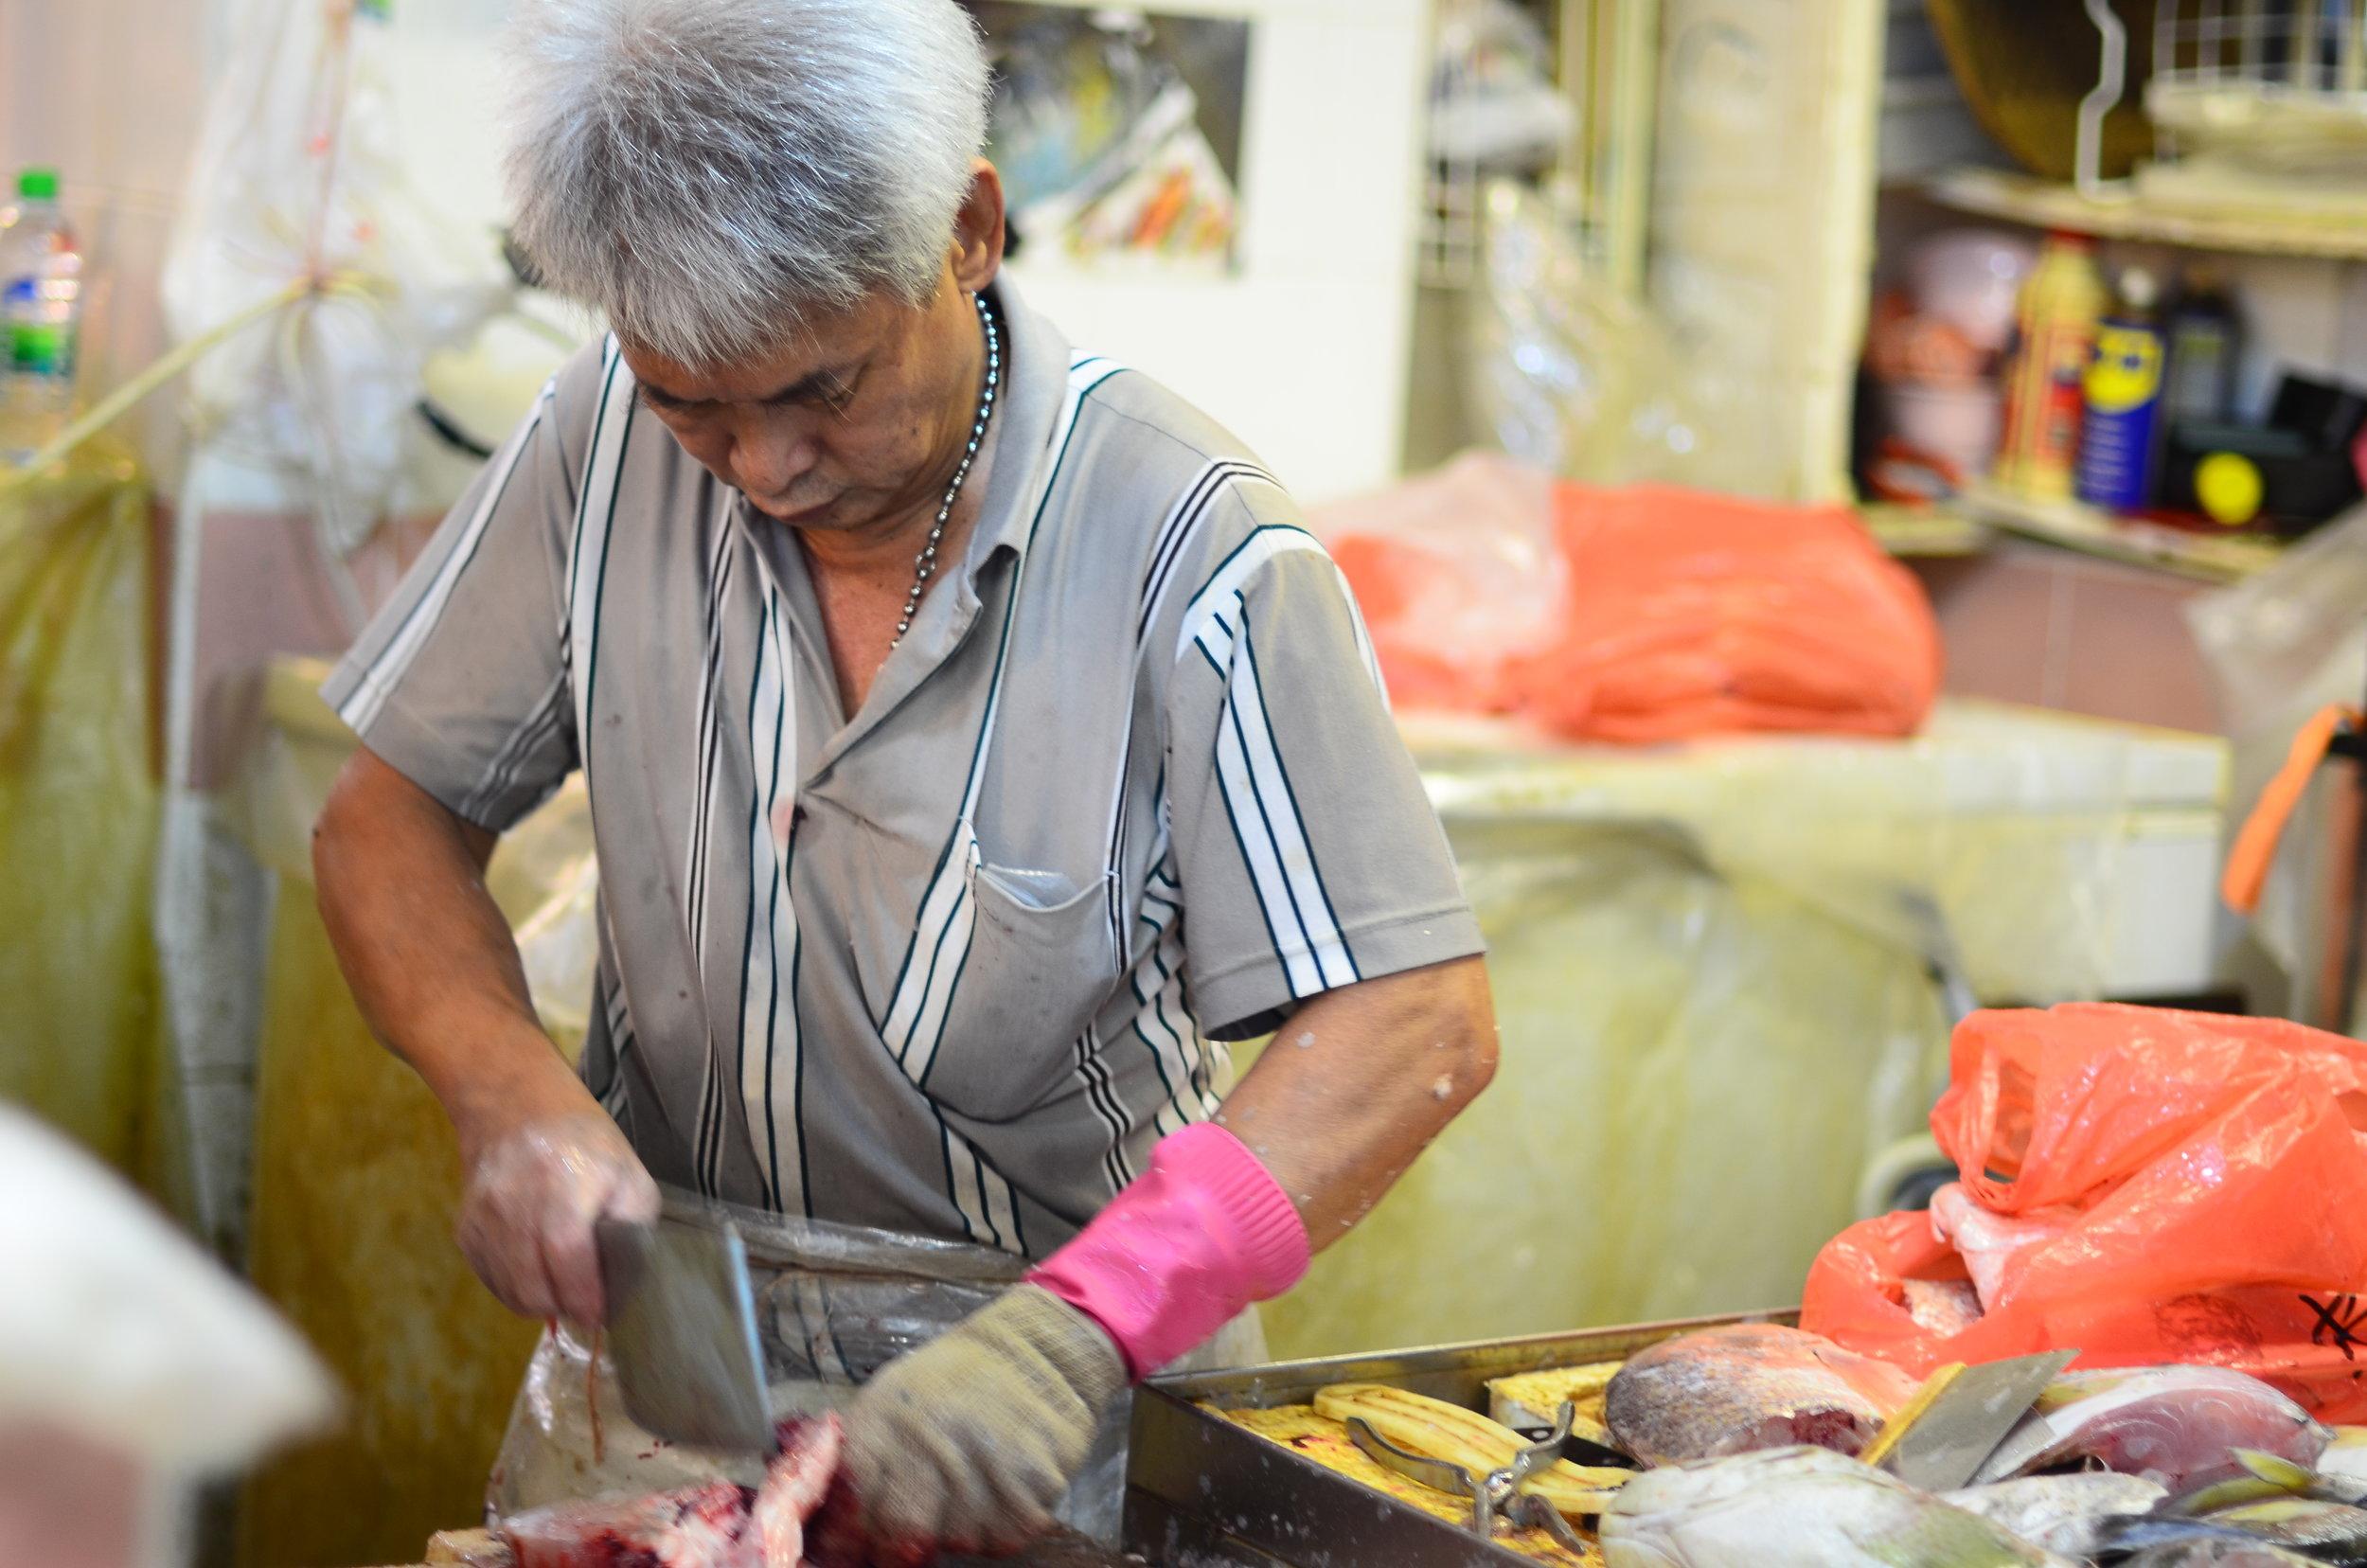 bill-the-butcher_6307770635_o.jpg